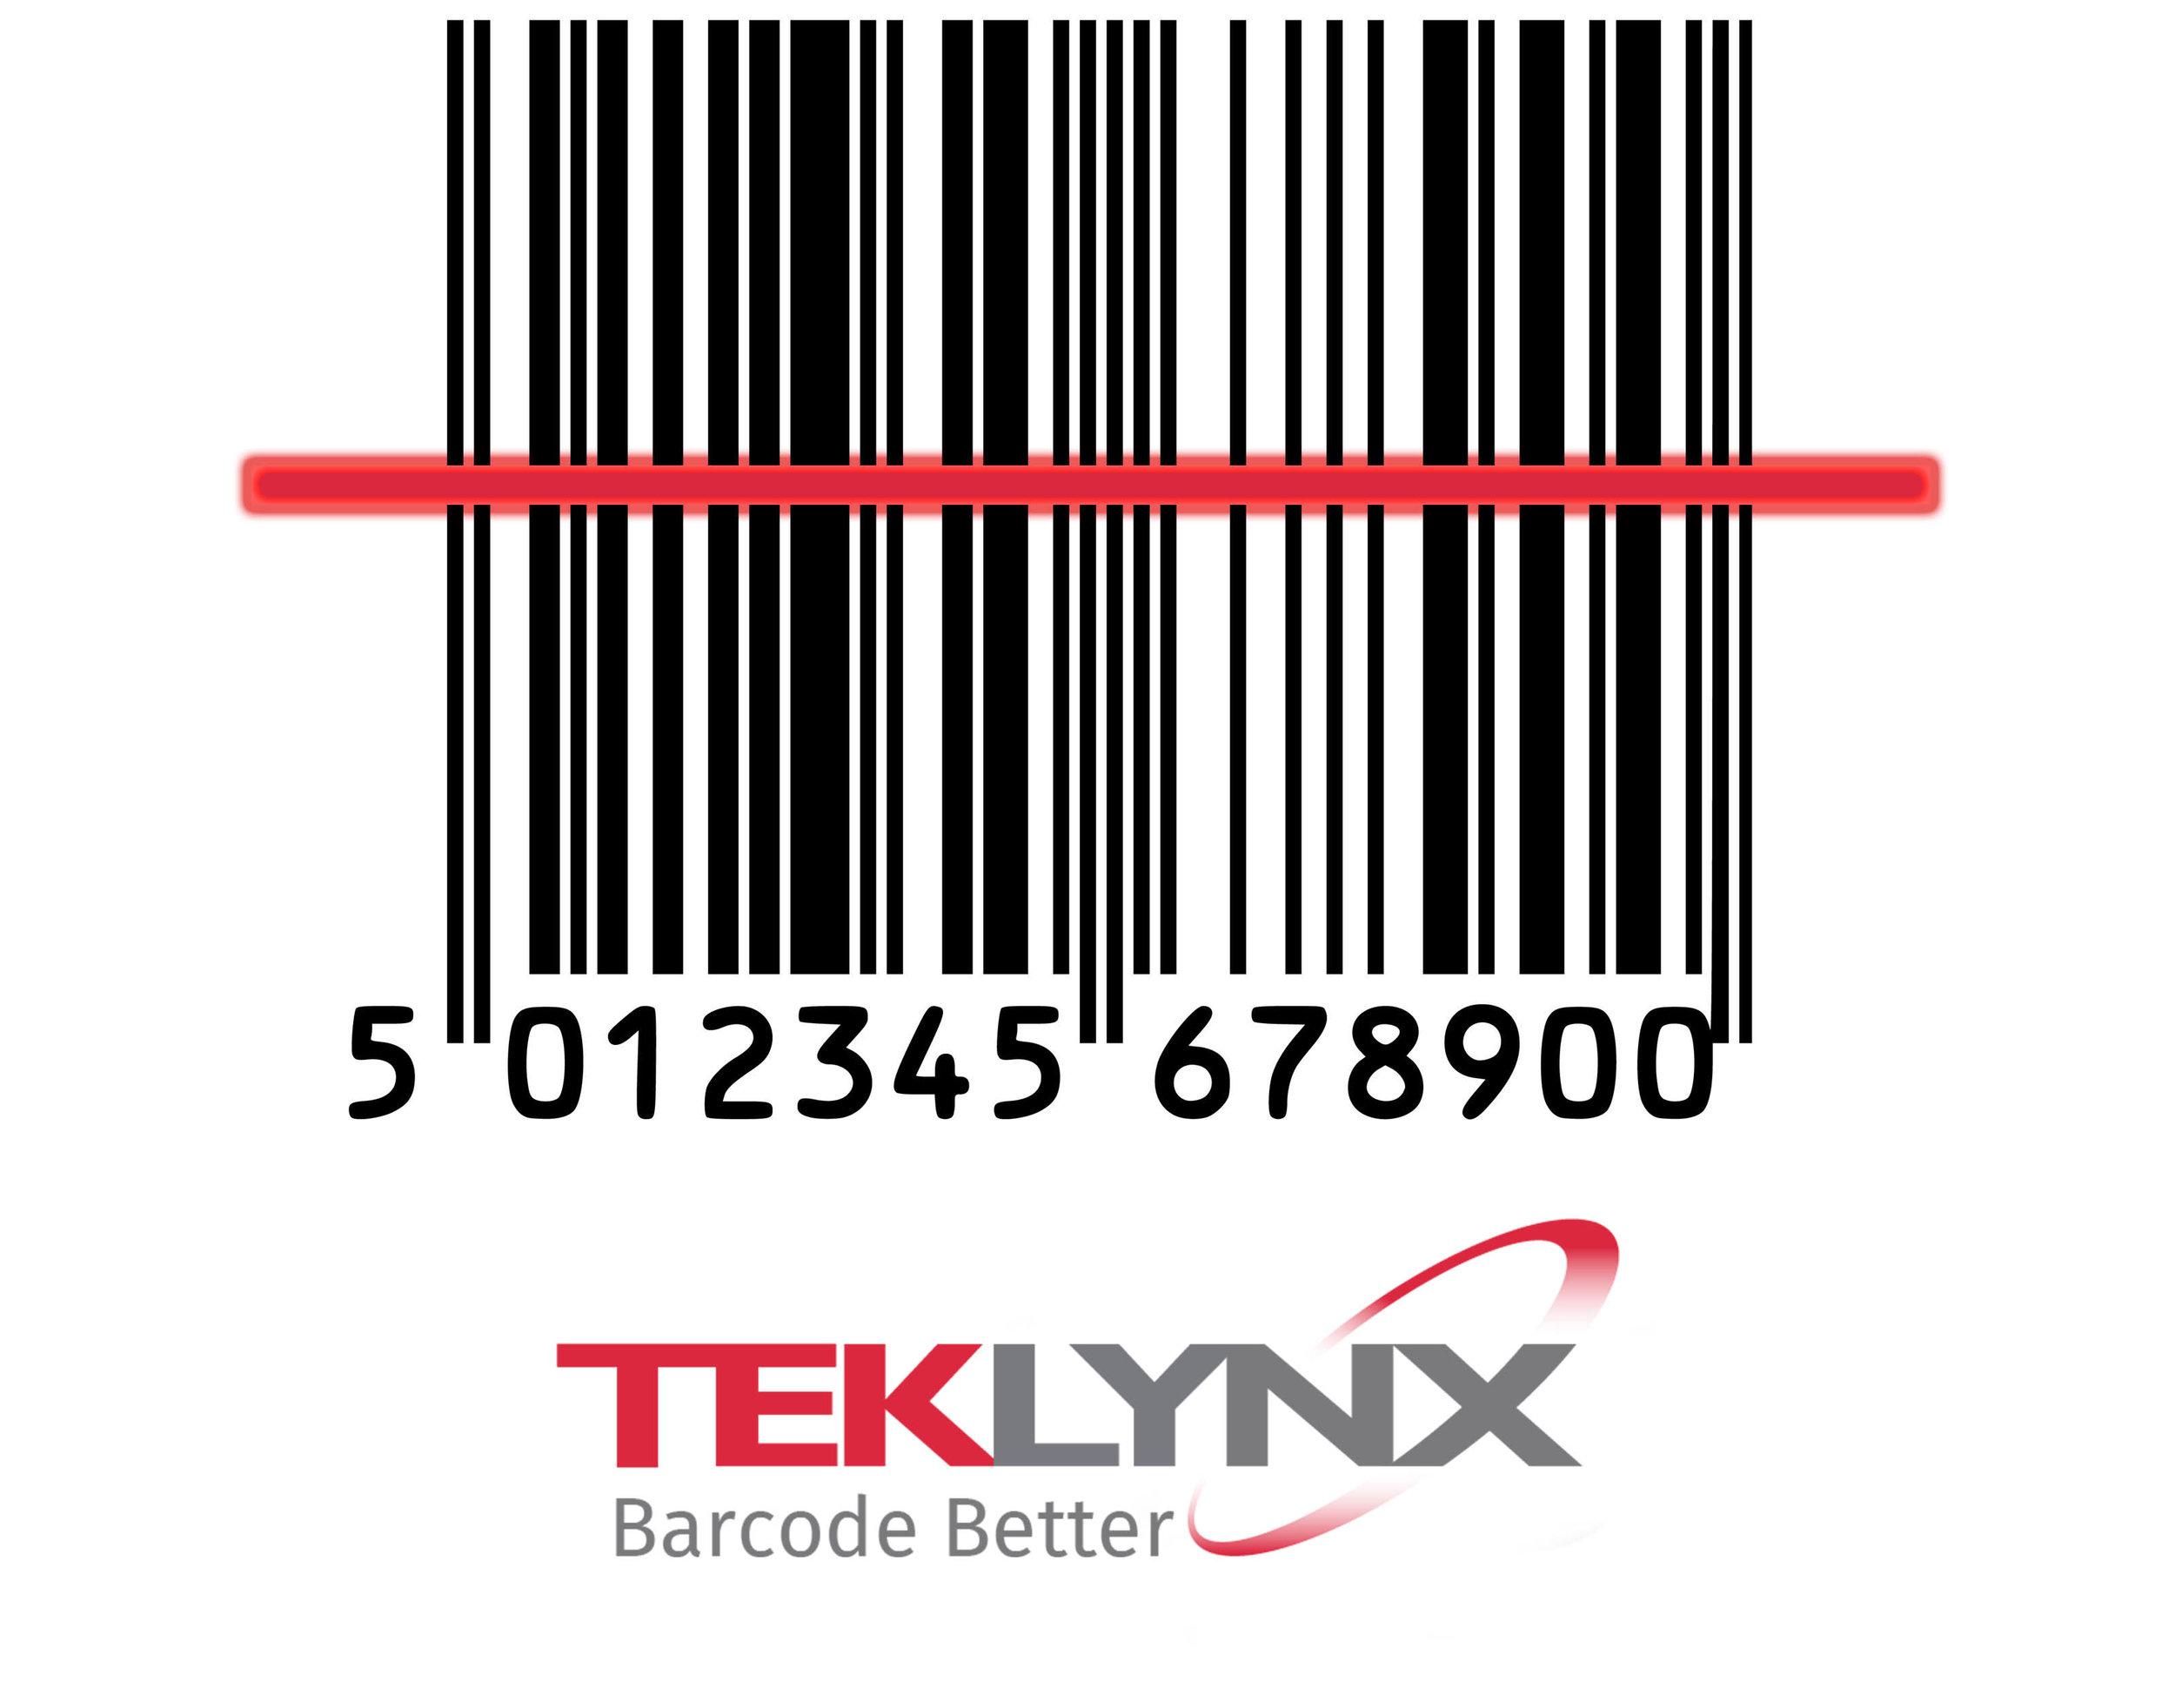 TekLynx_bar-code-150961_NewLogo.jpg